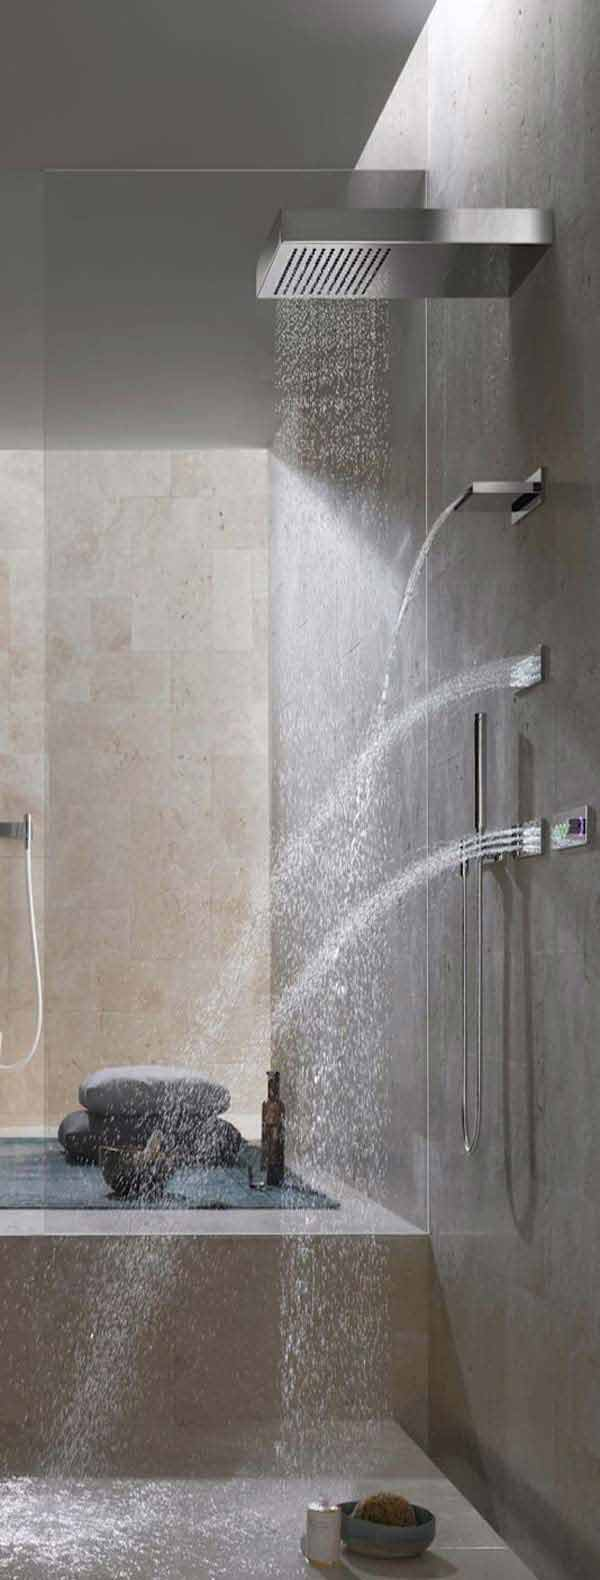 AD-Rain-Showers-Bathroom-Ideas-27